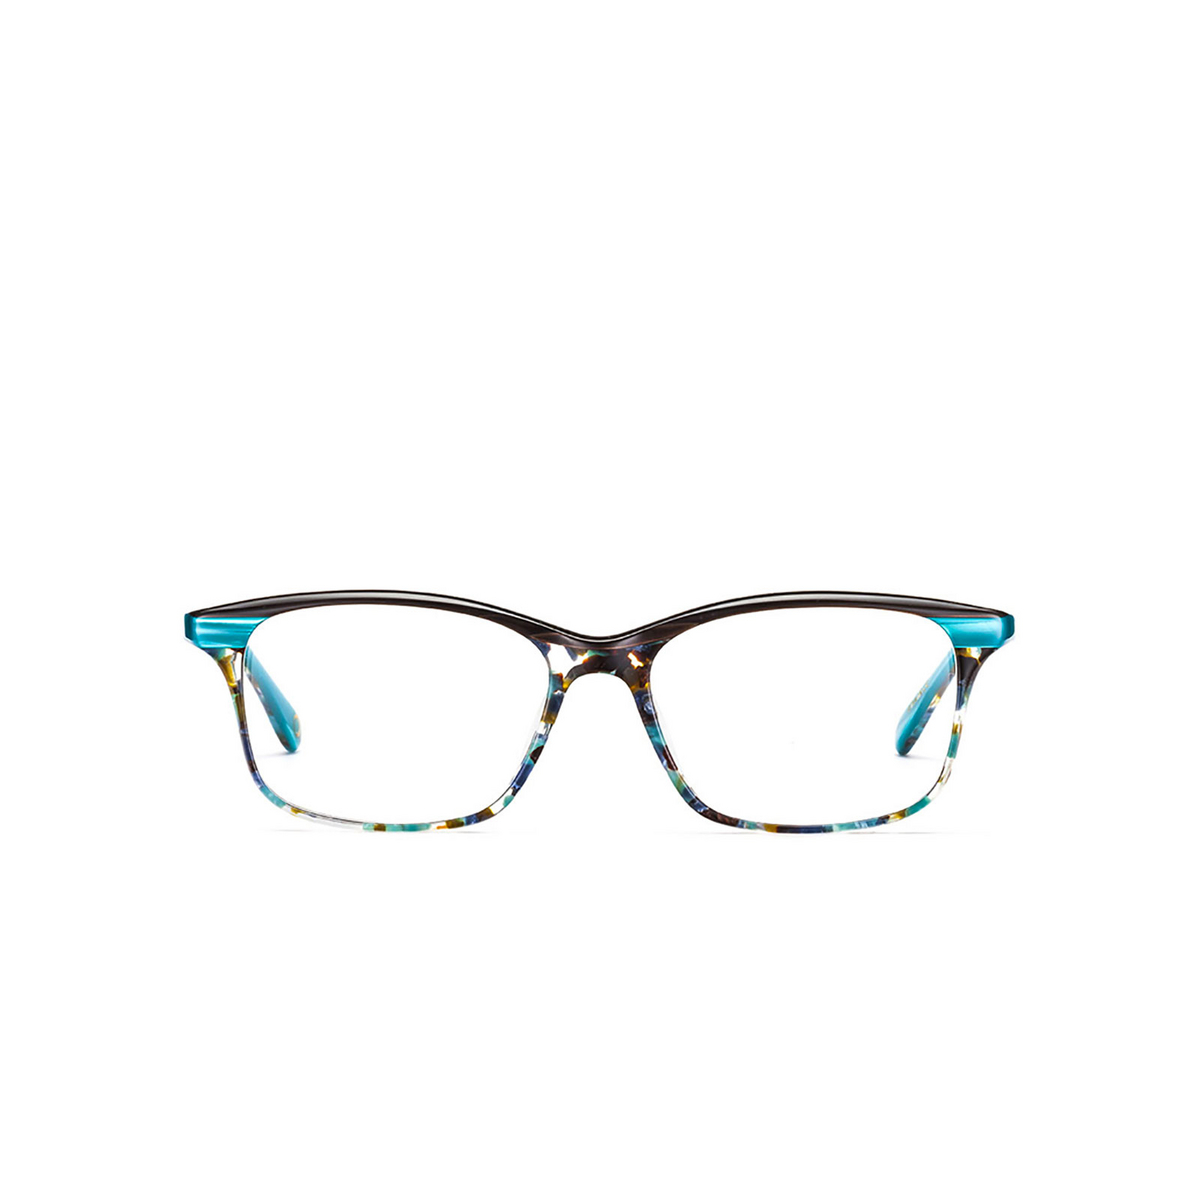 Etnia Barcelona® Square Eyeglasses: Vicenza color Tqbr - front view.